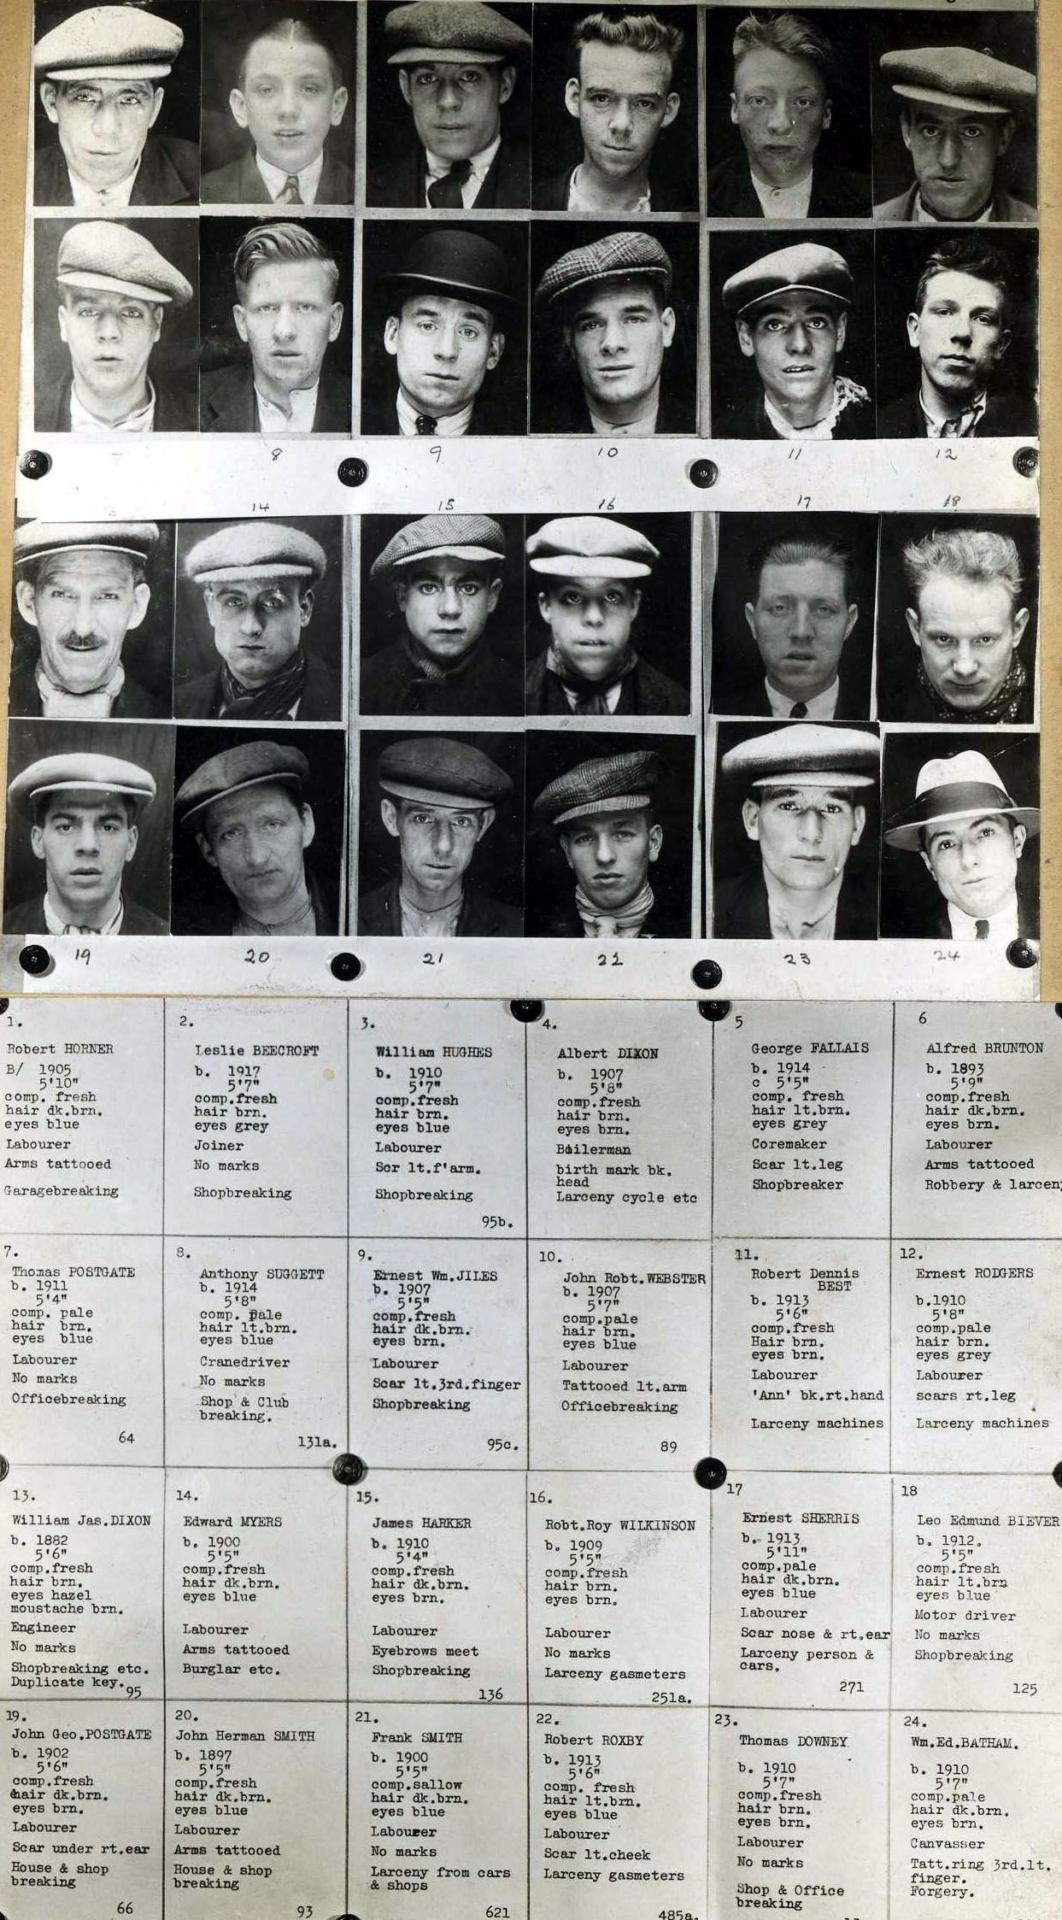 Black and white 1930's Mug Shot Book